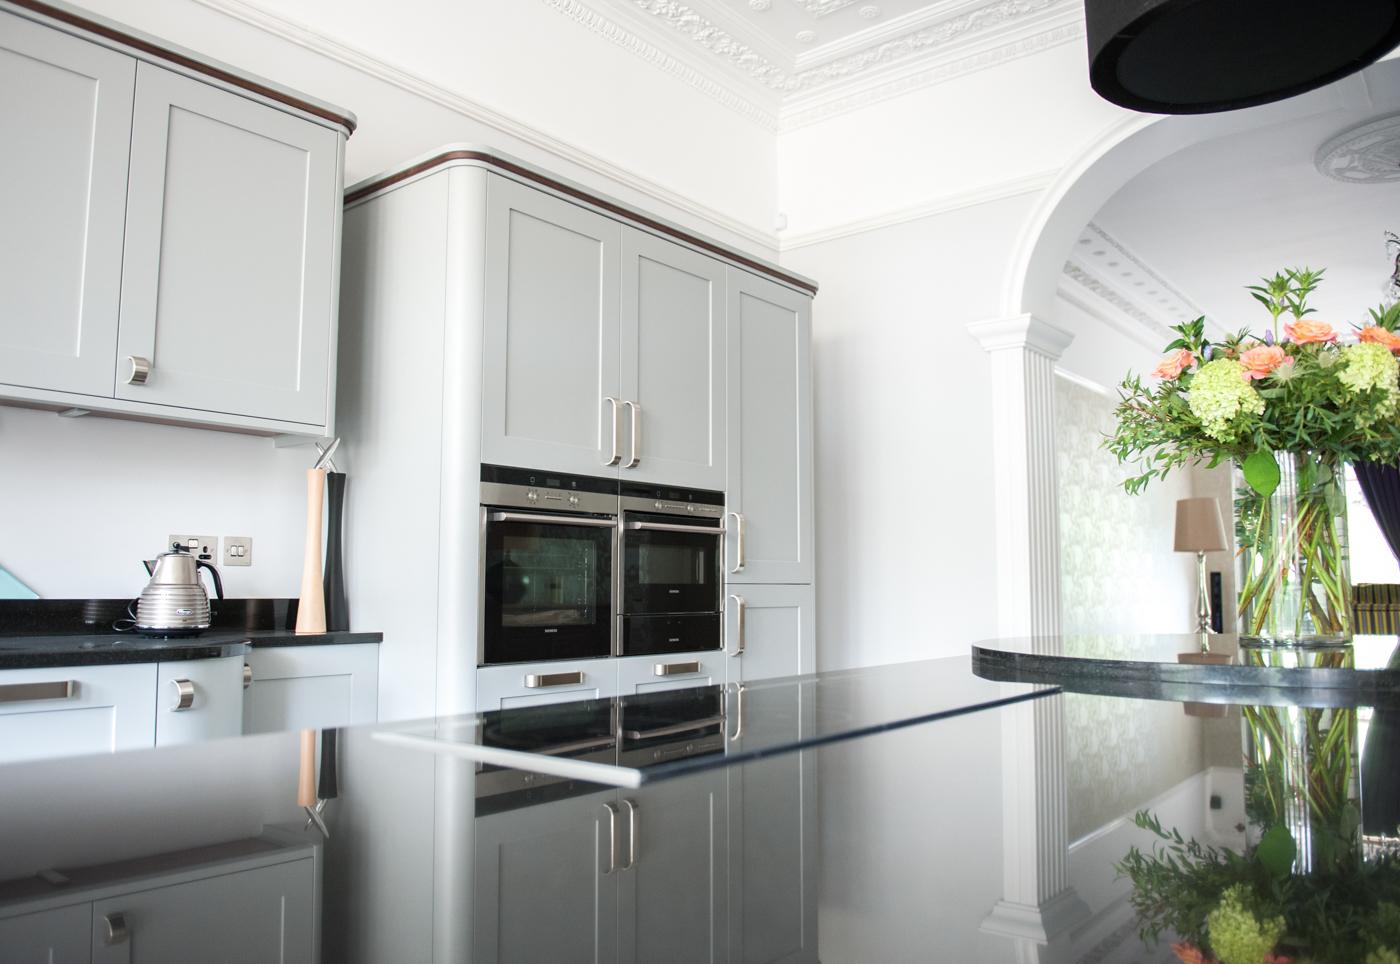 interior photography glasgow, burrell house glasgow, property photograpahy glasgow, kitchen interior